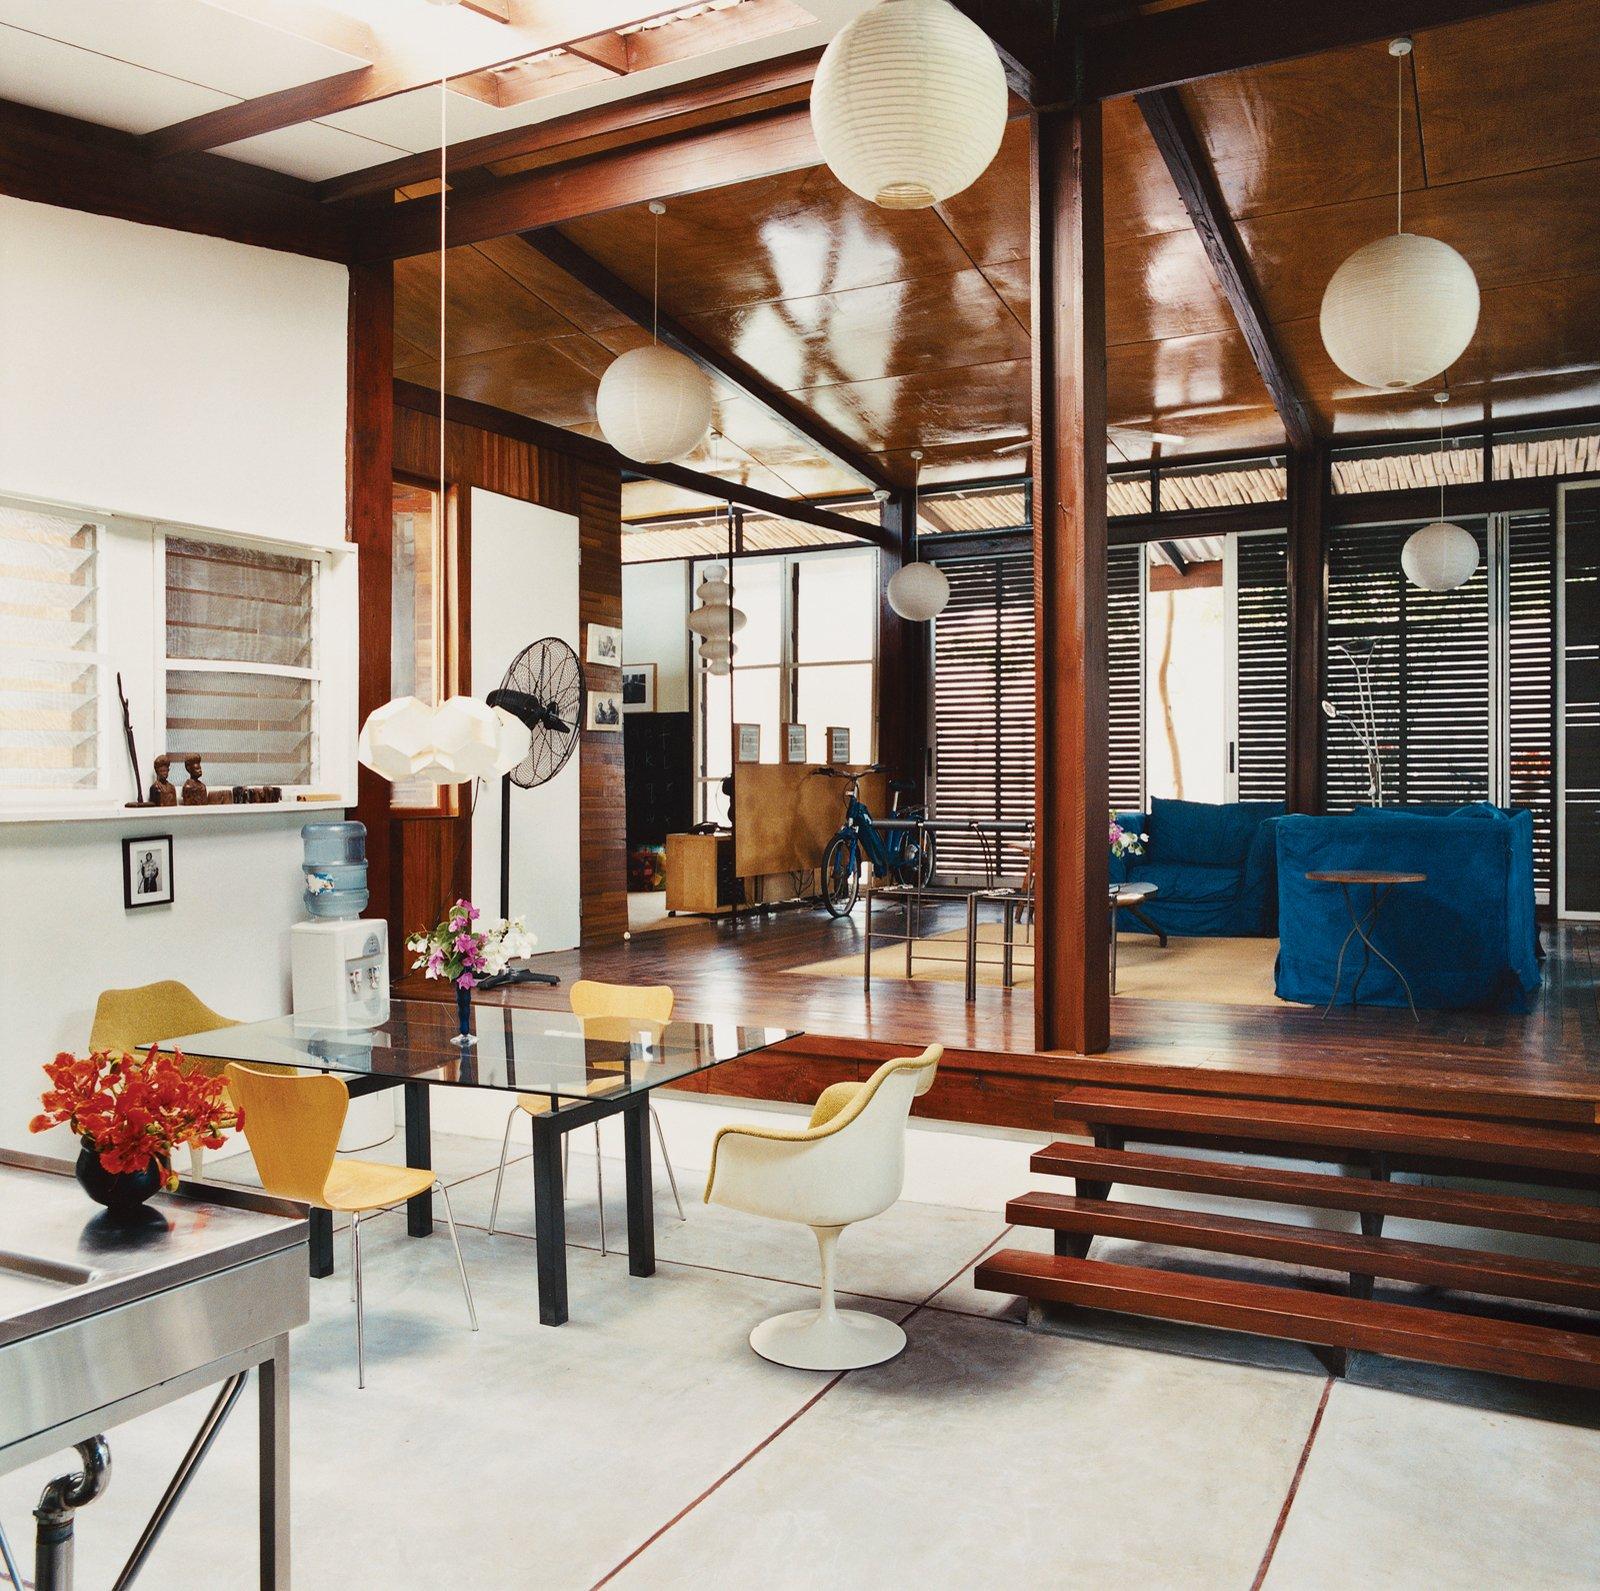 #lighting #livingroom #diningroom #steps  Photo by DOOK  60+ Modern Lighting Solutions by Dwell from Lighting